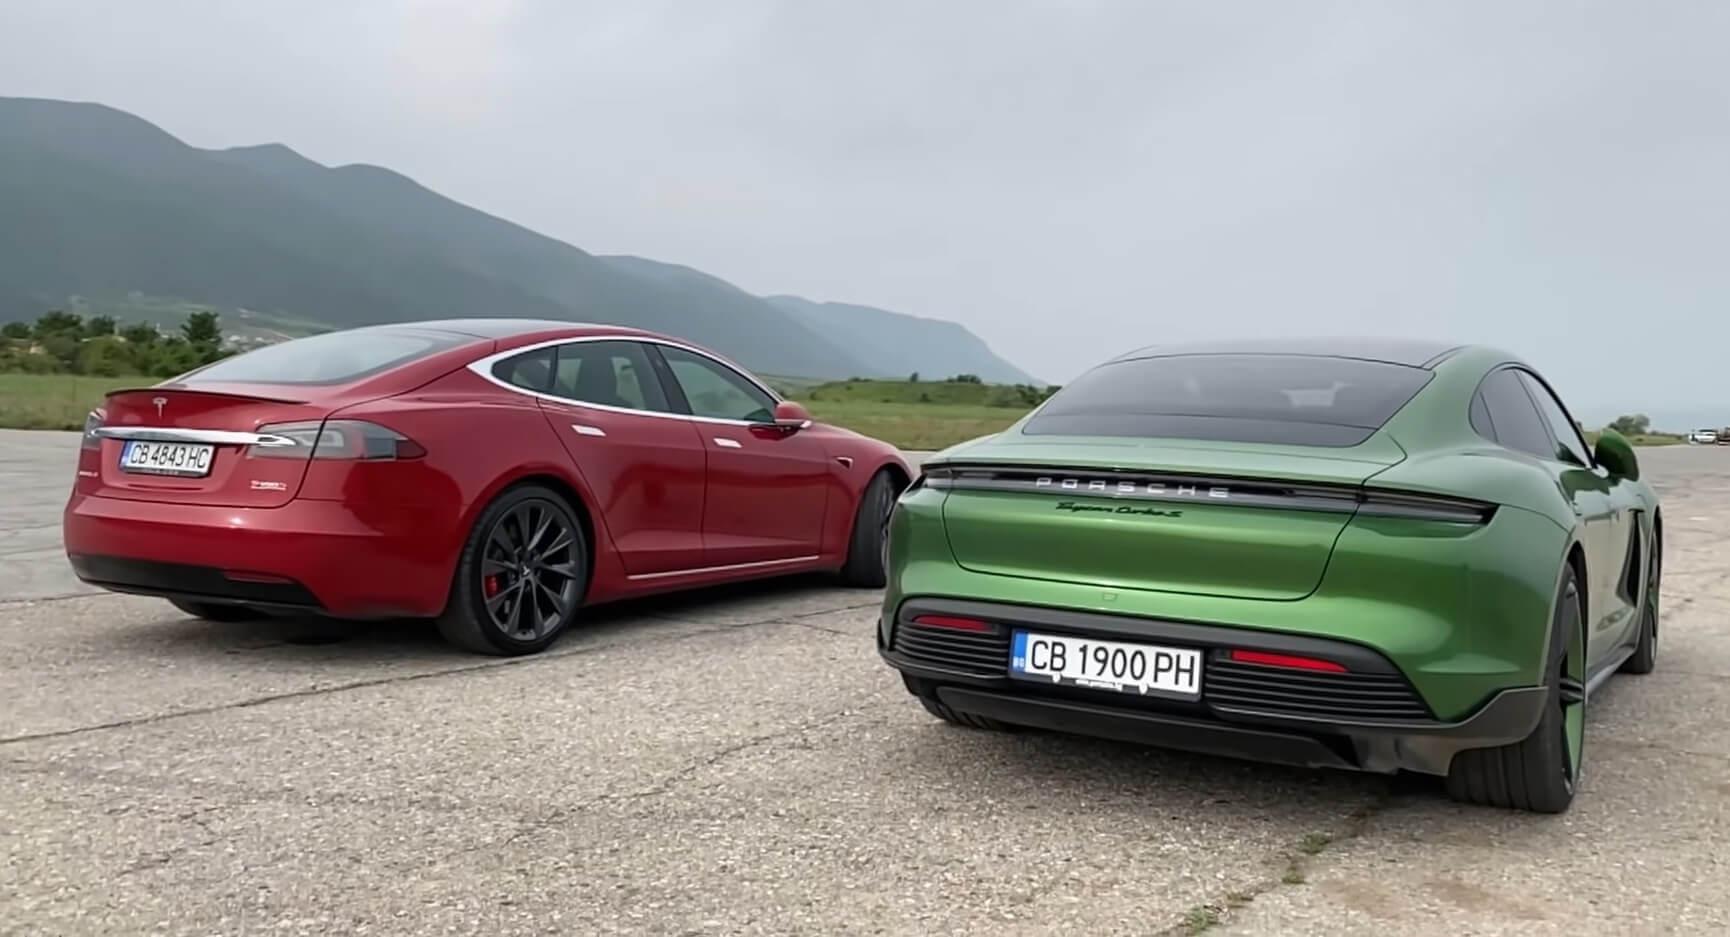 Porsche Taycan Turbo S vs. Tesla Model S P100D